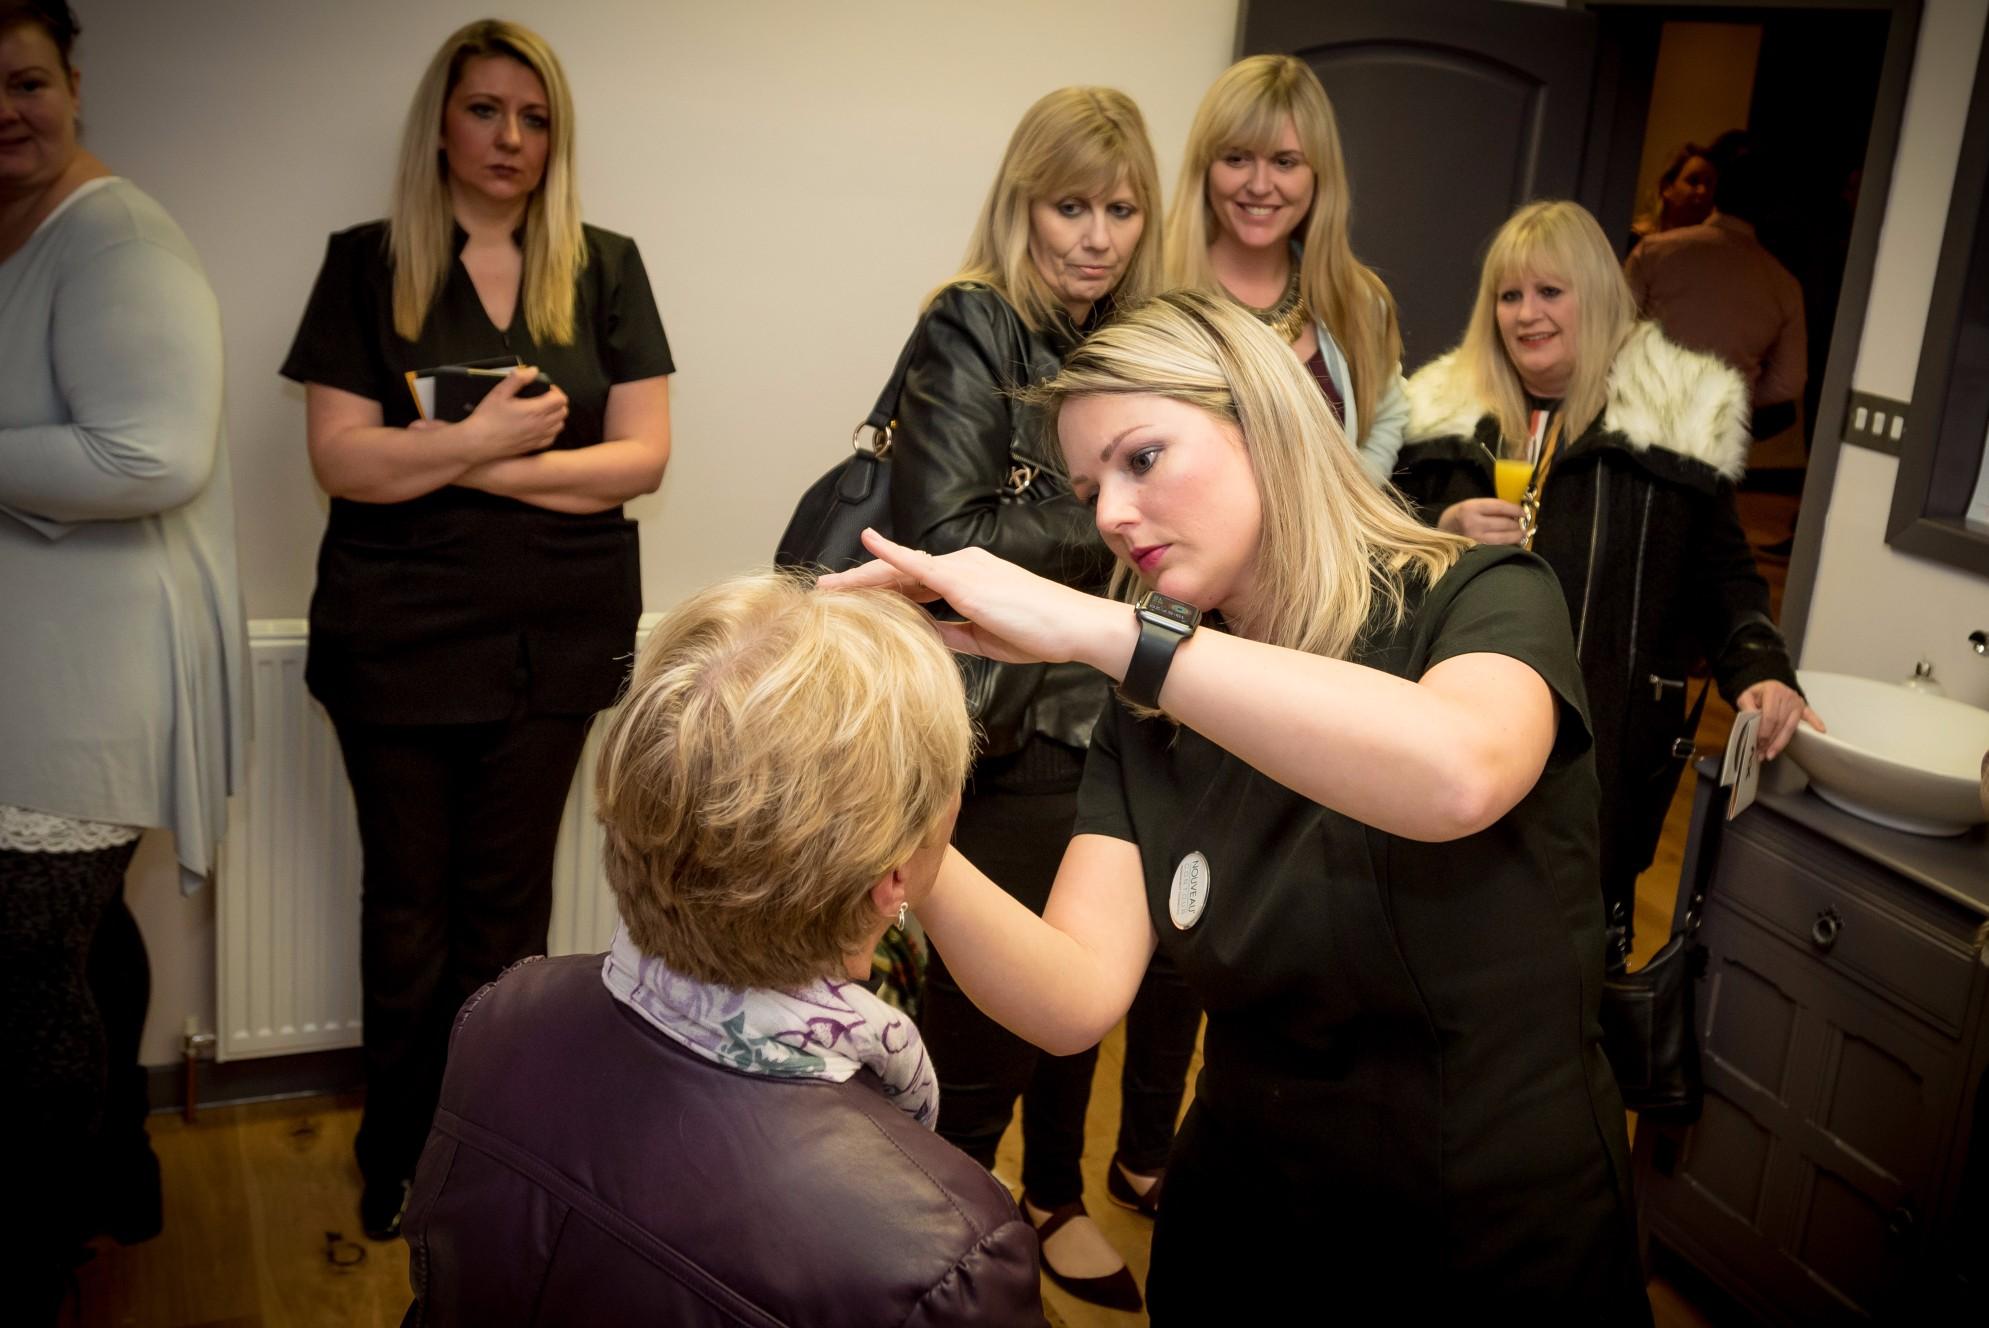 XIV Hair Salon Ripponden | XIV Facial Aesthetics Clinic Ripponden | XIV Semi Permanent Makeup Ripponden